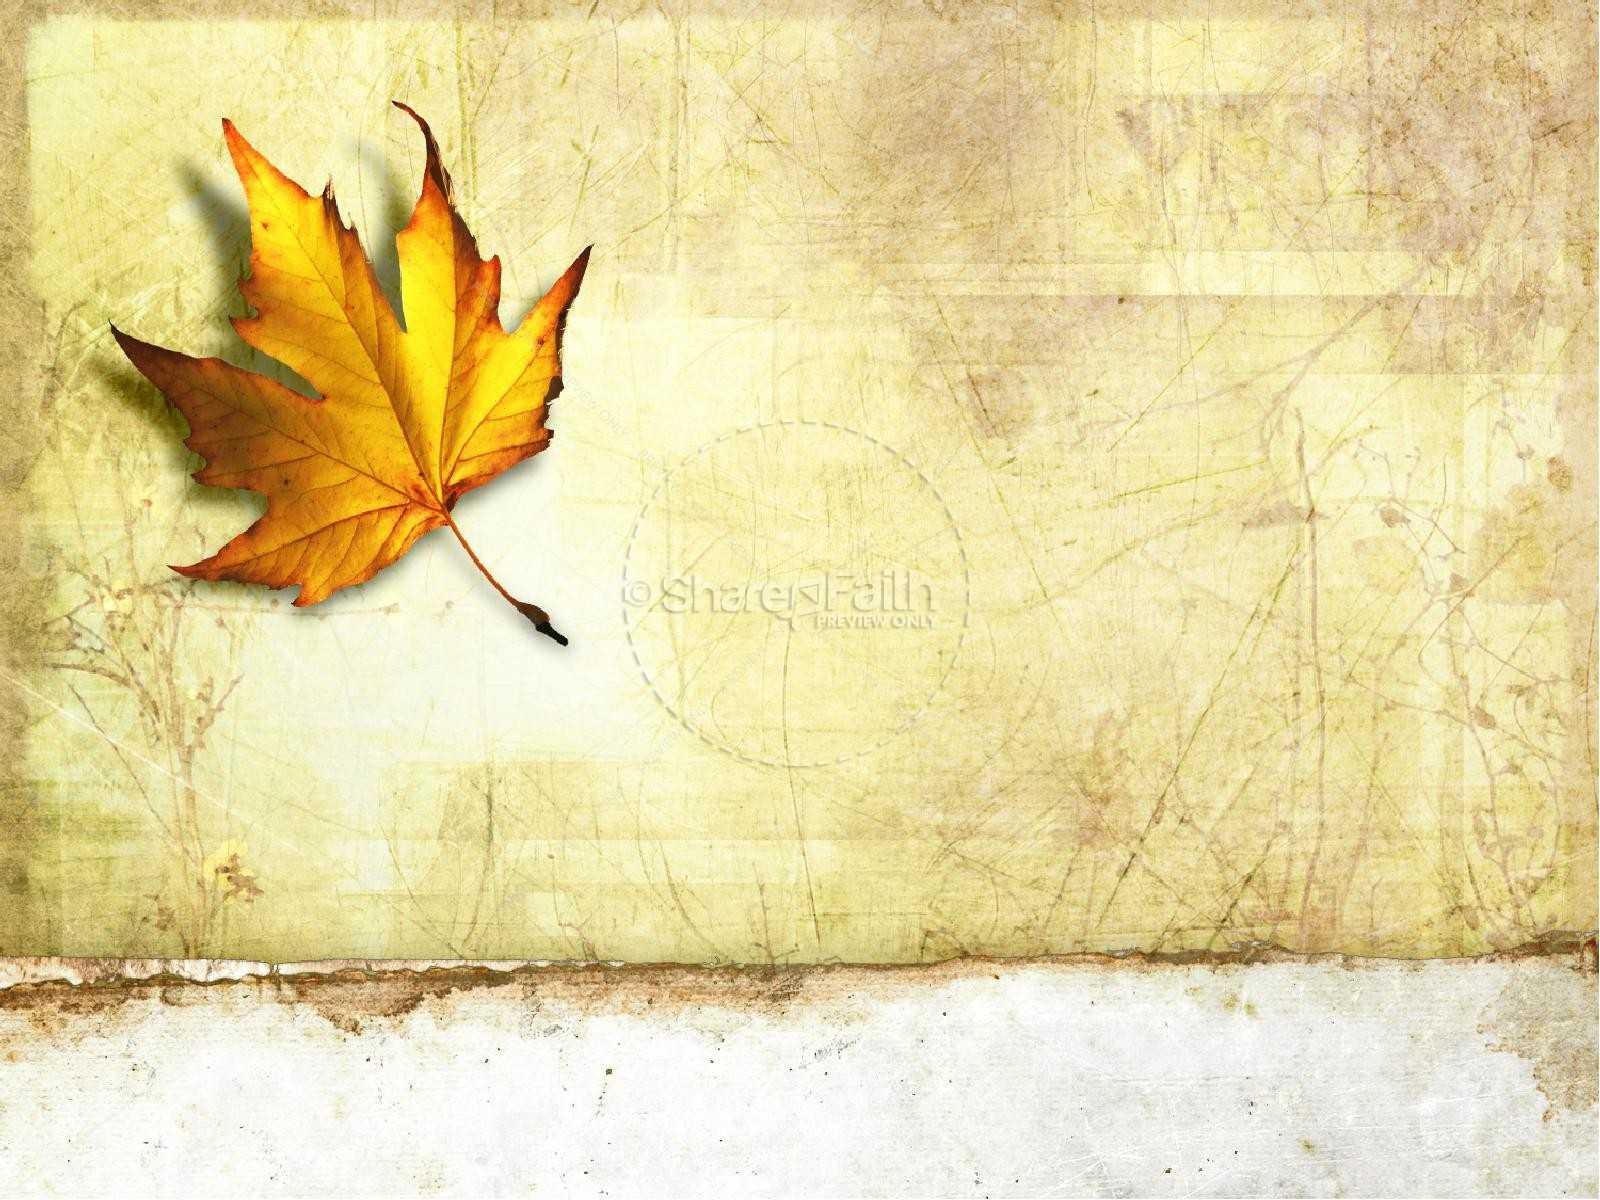 Autumn Powerpoint Template   Fall Thanksgiving Powerpoints For Free Fall Powerpoint Templates